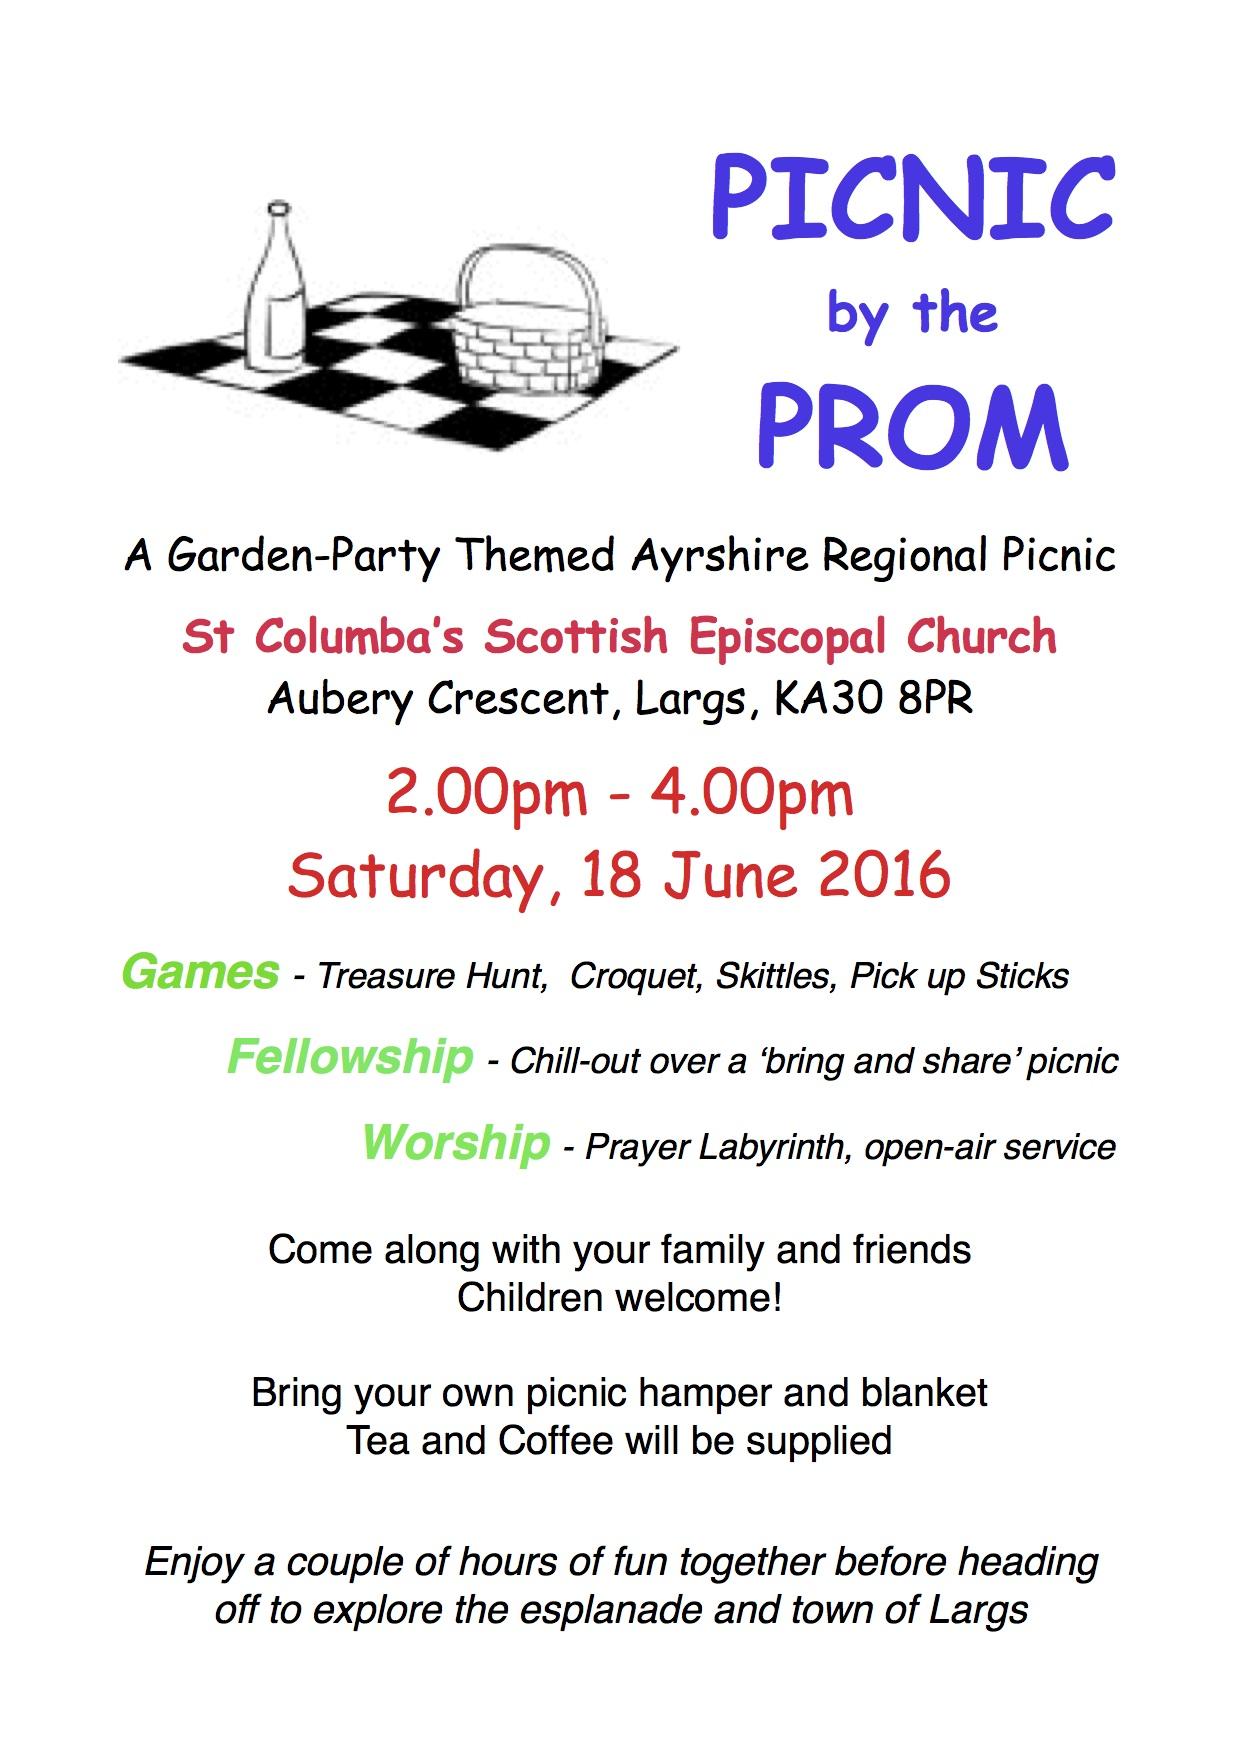 picnic poster PDF 2016   St Columba's Scottish Episcopal Church Largs